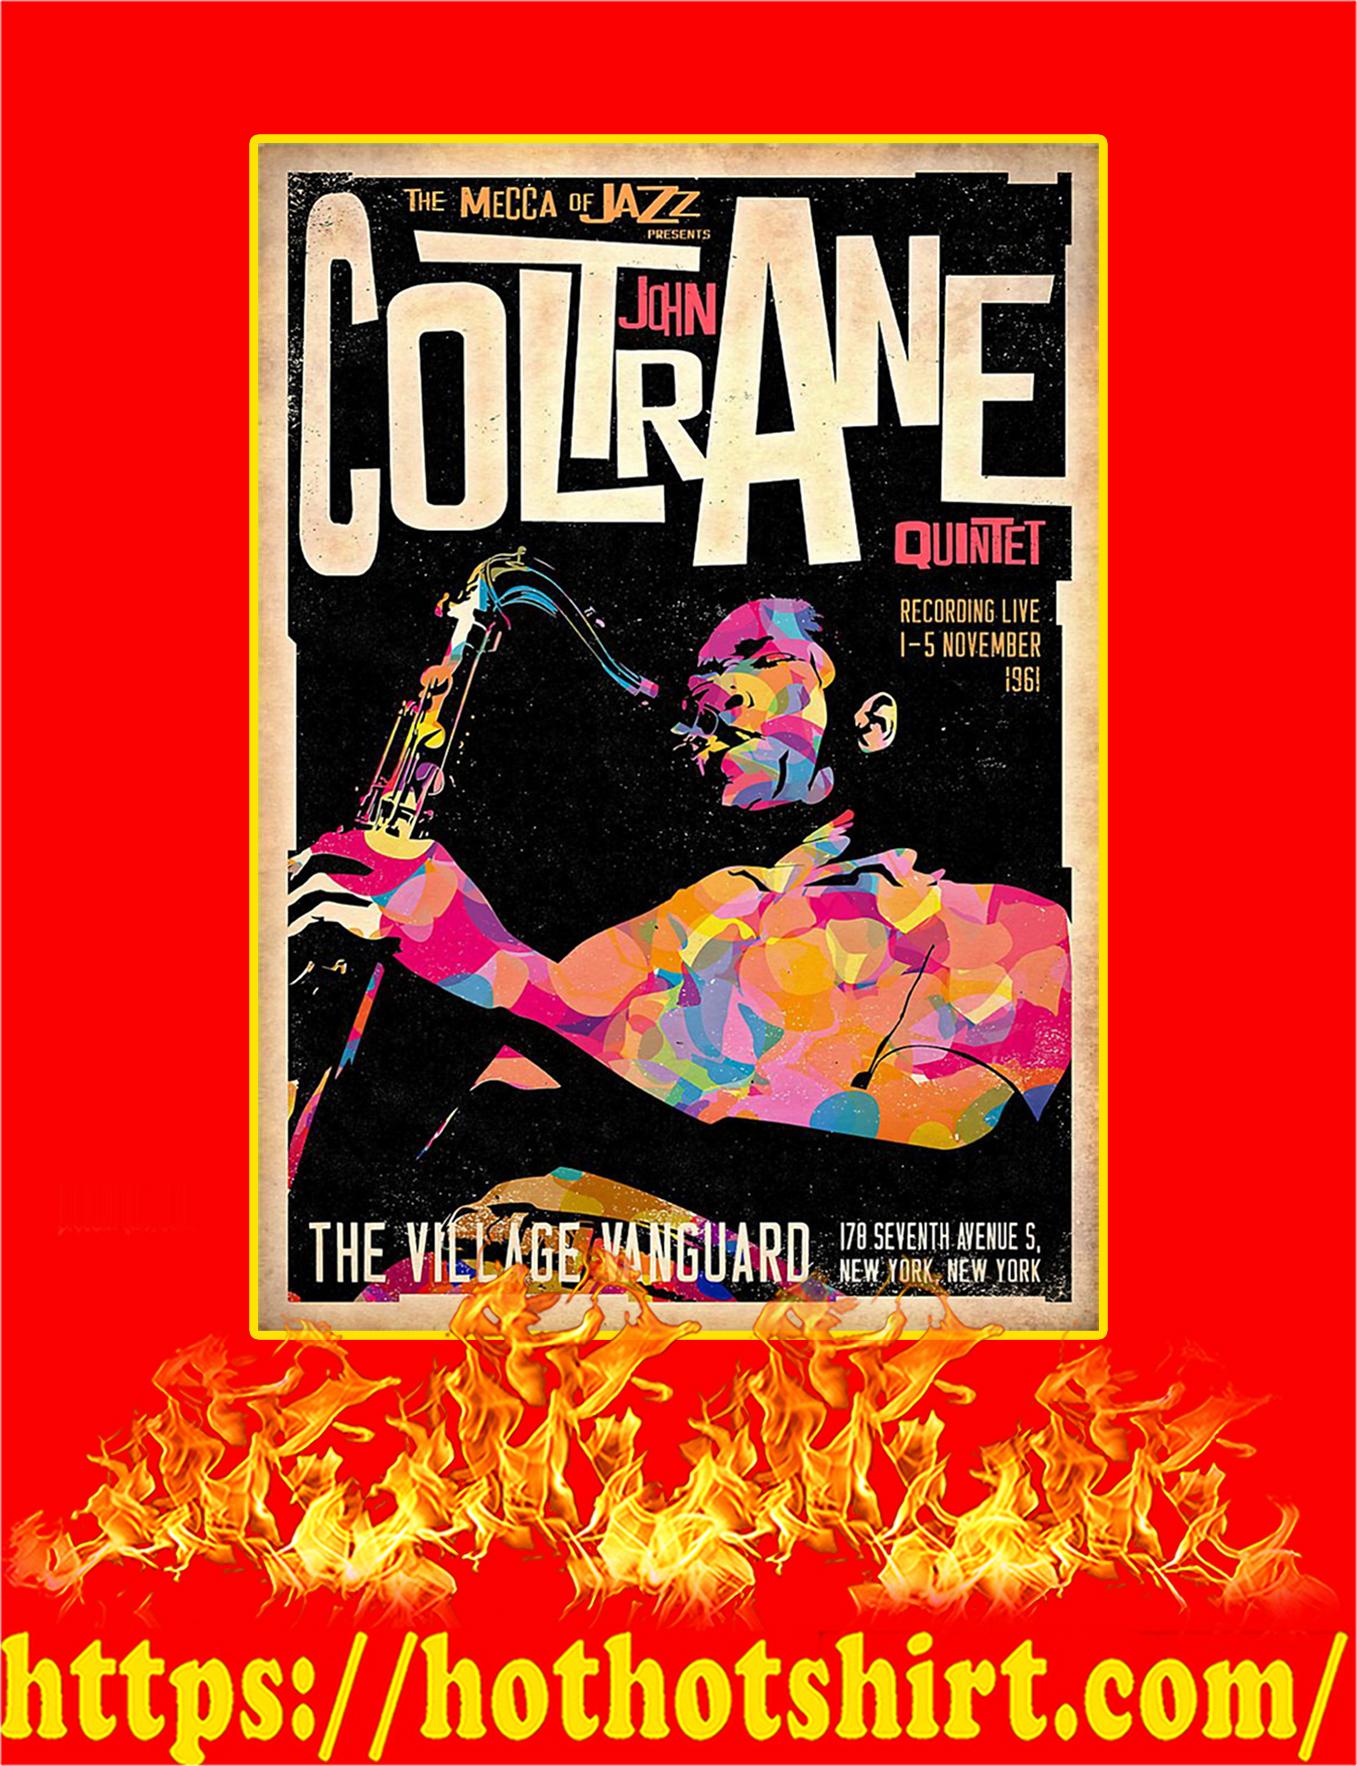 John Coltrane Quintet Poster - A2